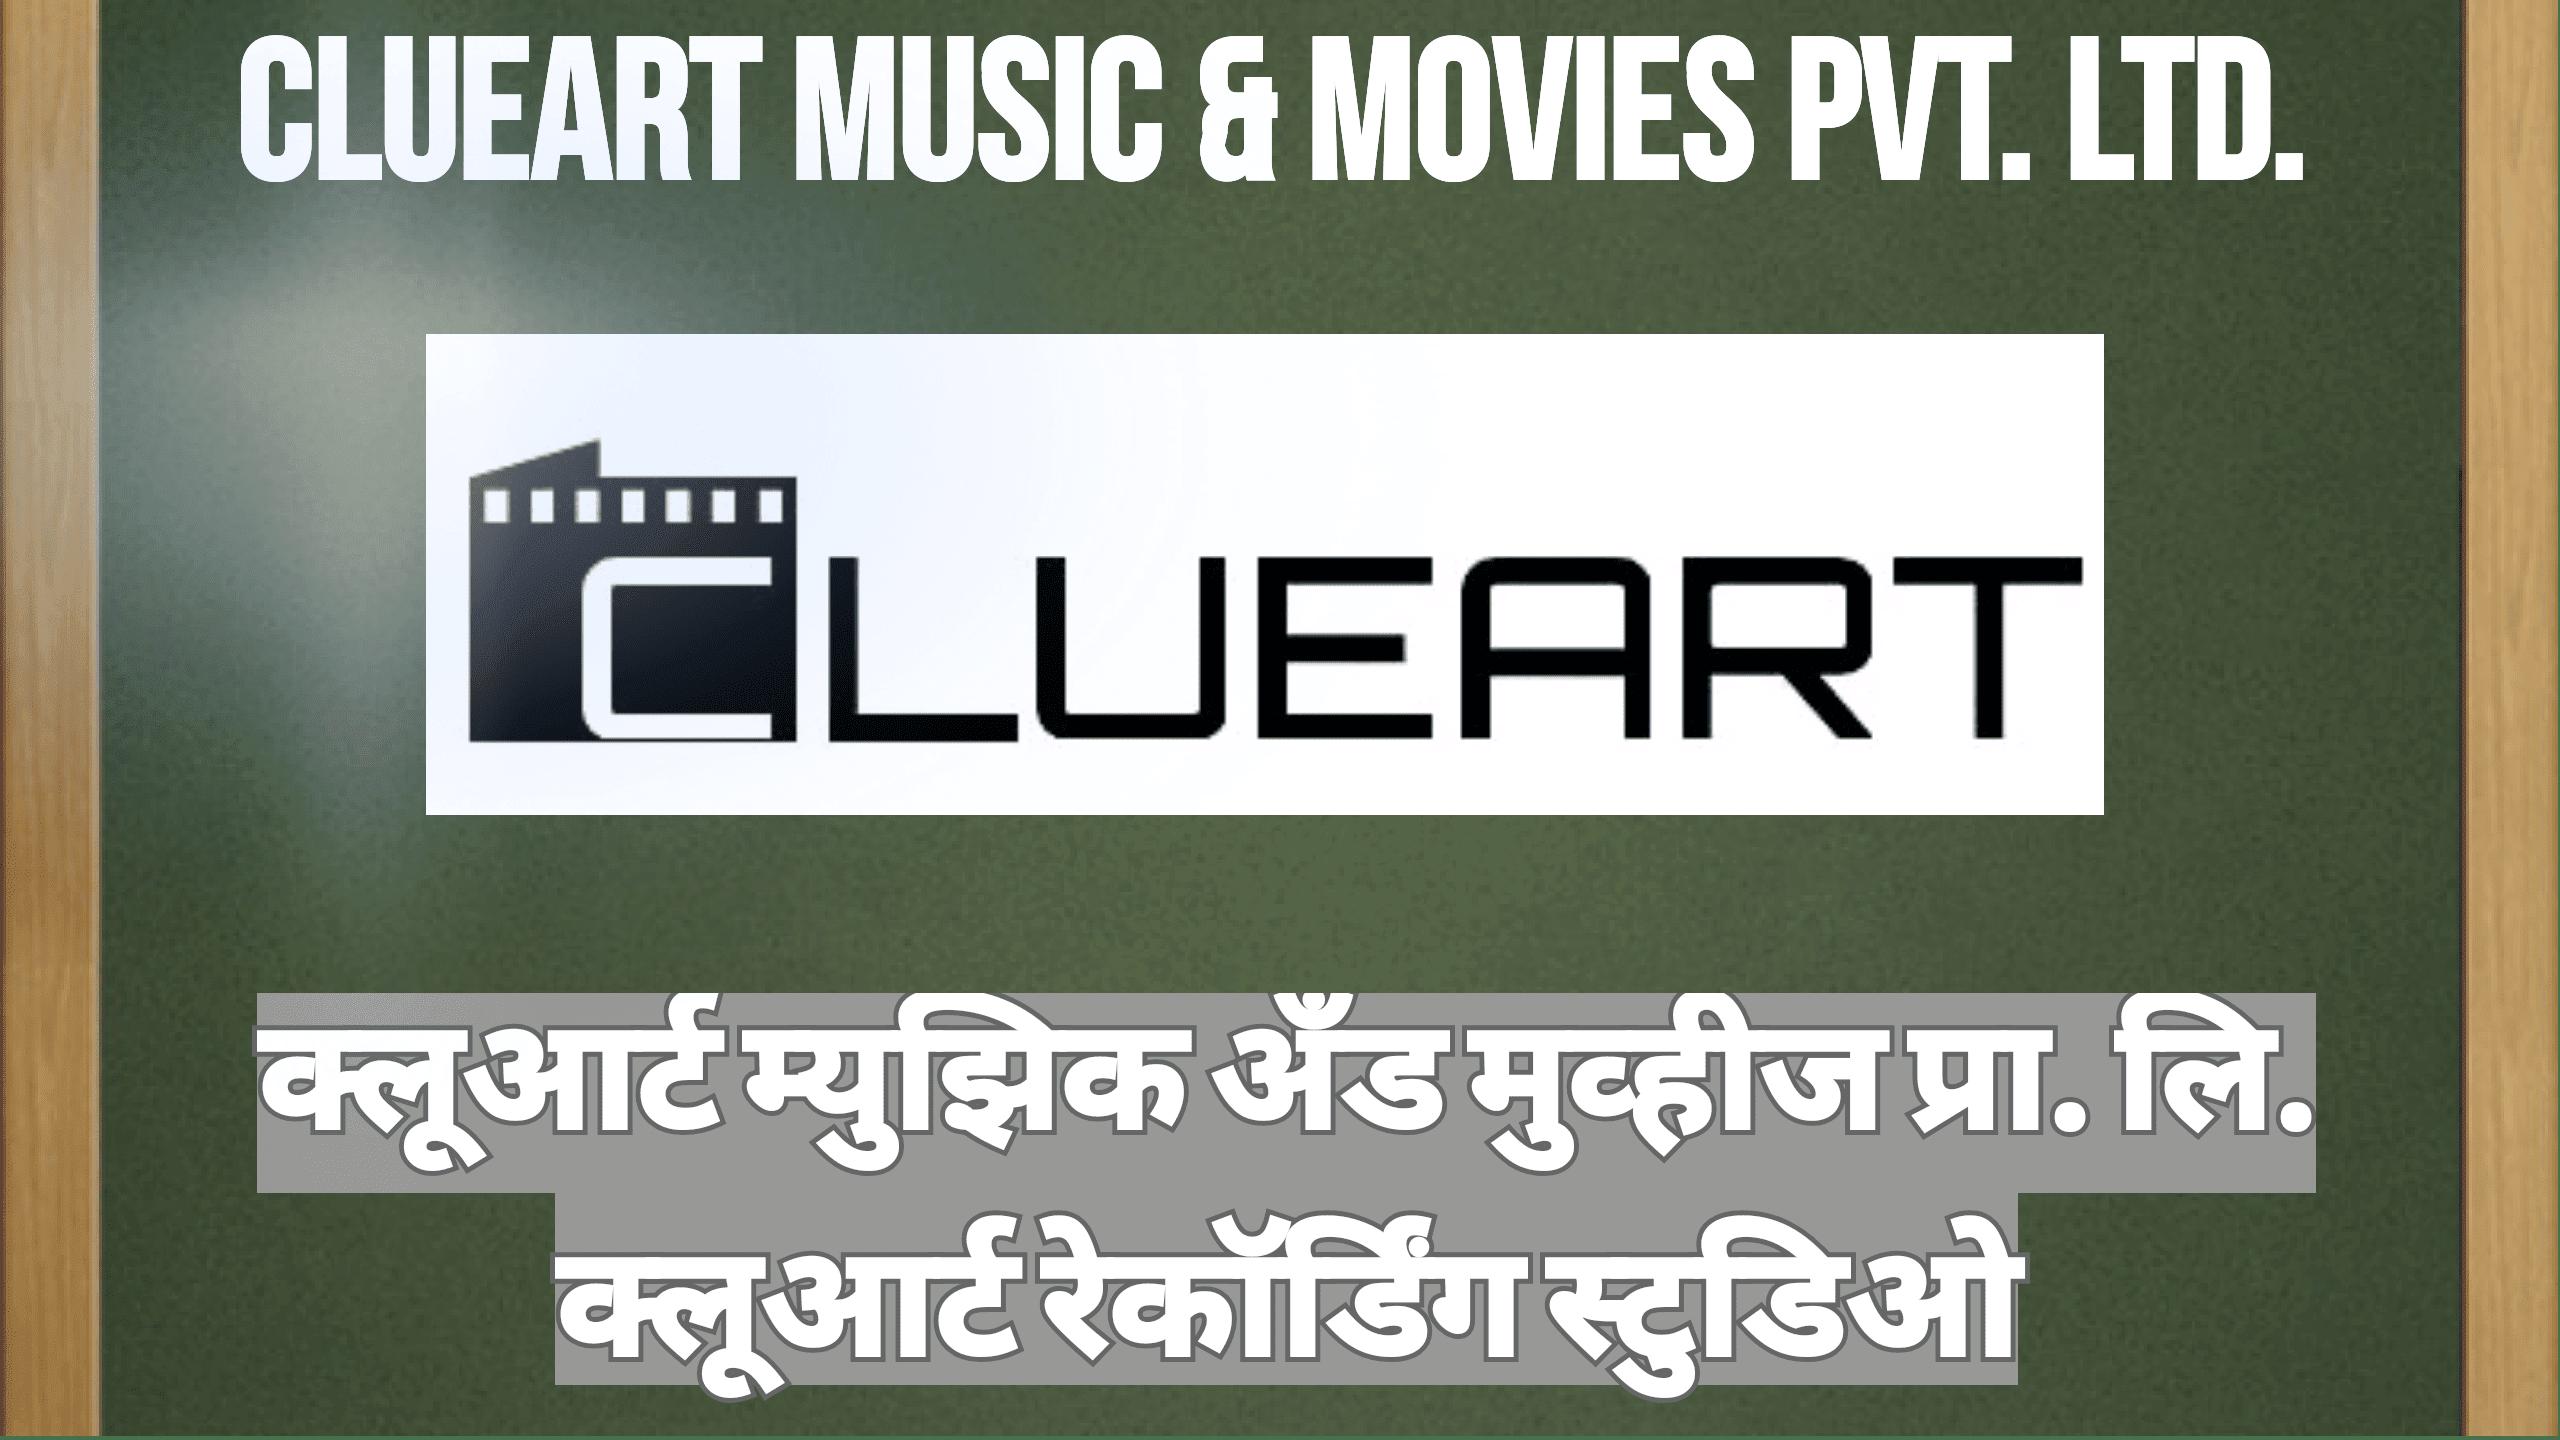 Clueart Music & Movies